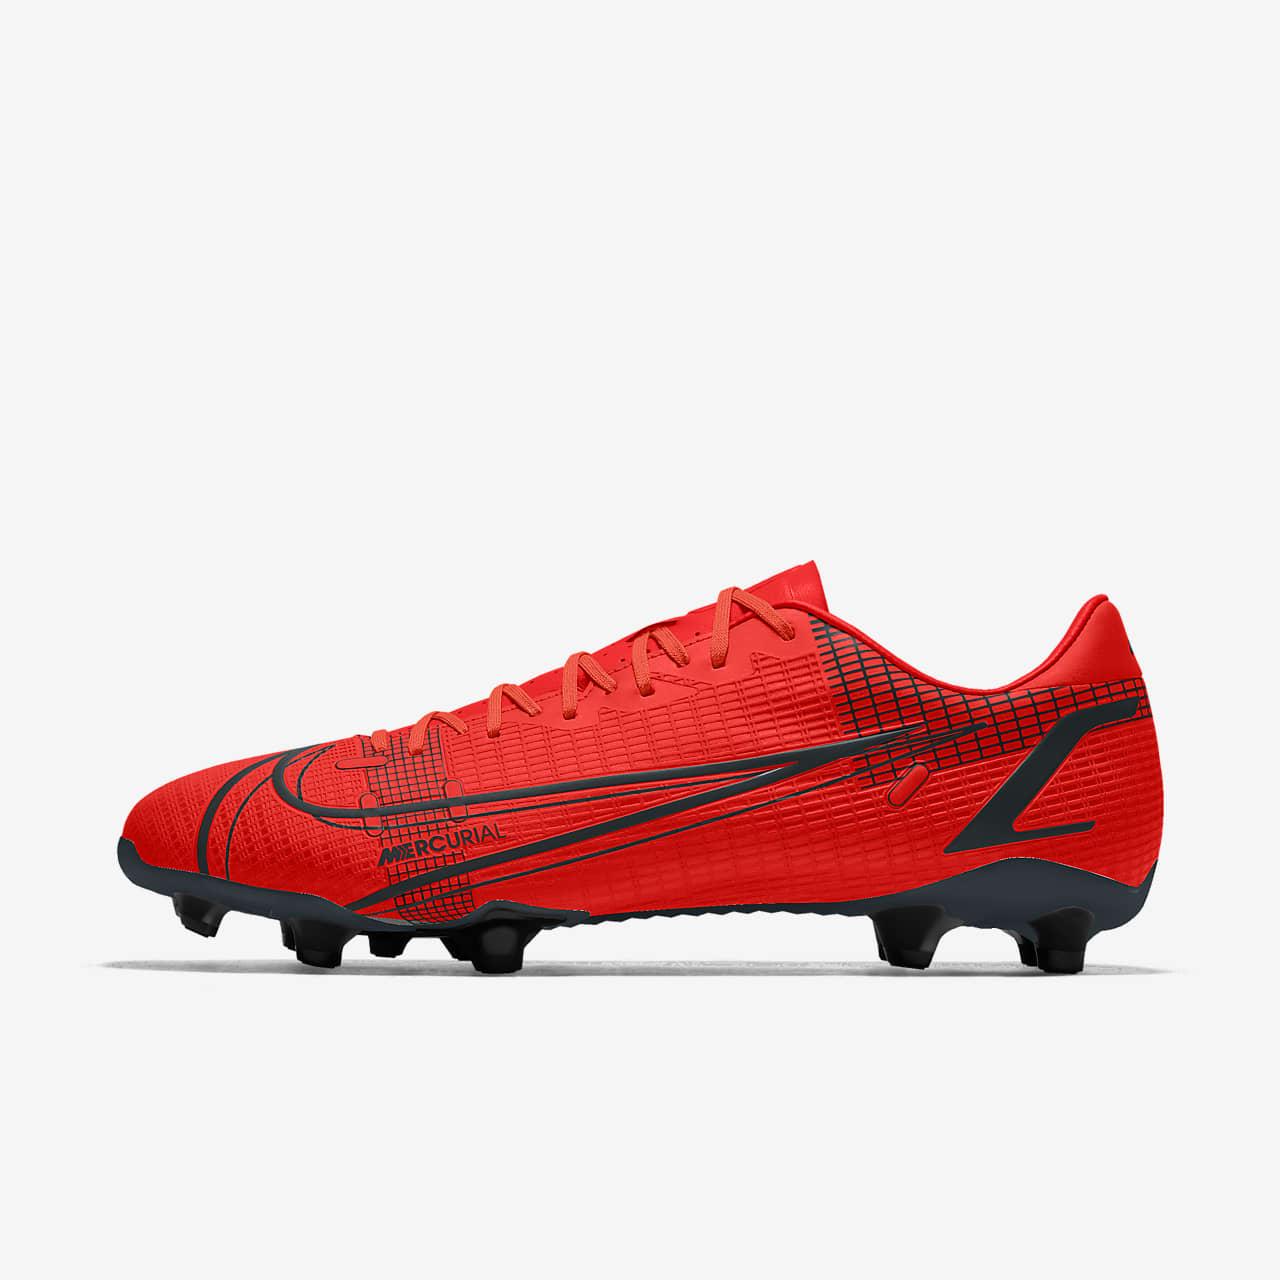 Scarpa da calcio personalizzabile Nike Mercurial Vapor 14 Academy By You